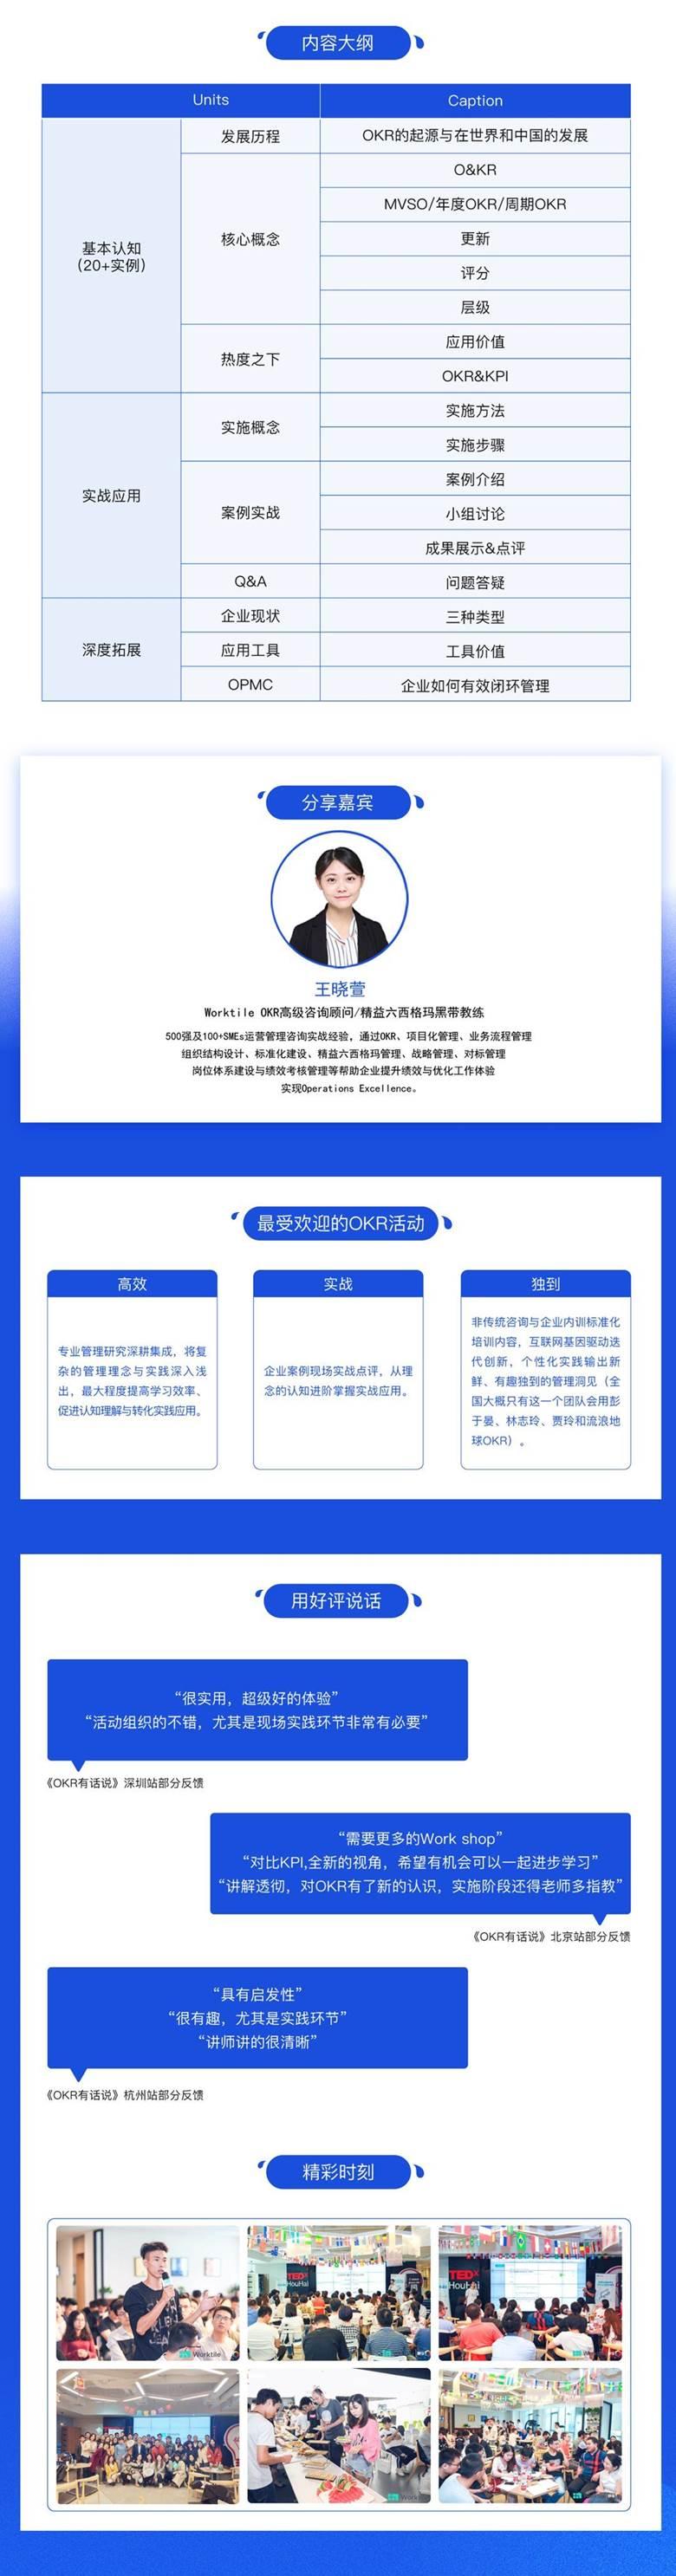 OKR有话说(网页2)广州站 (1).png